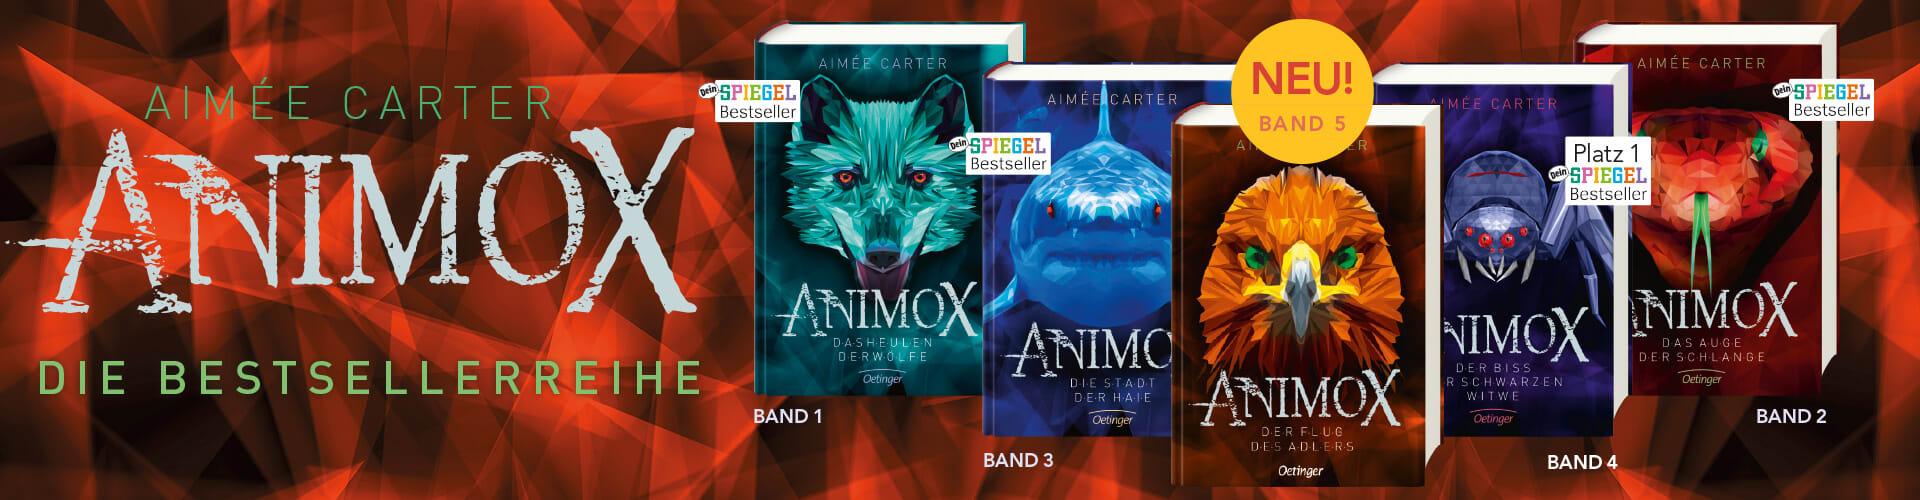 Aimee Carter. Animox. Die Spiegel-Bestsellerreihe